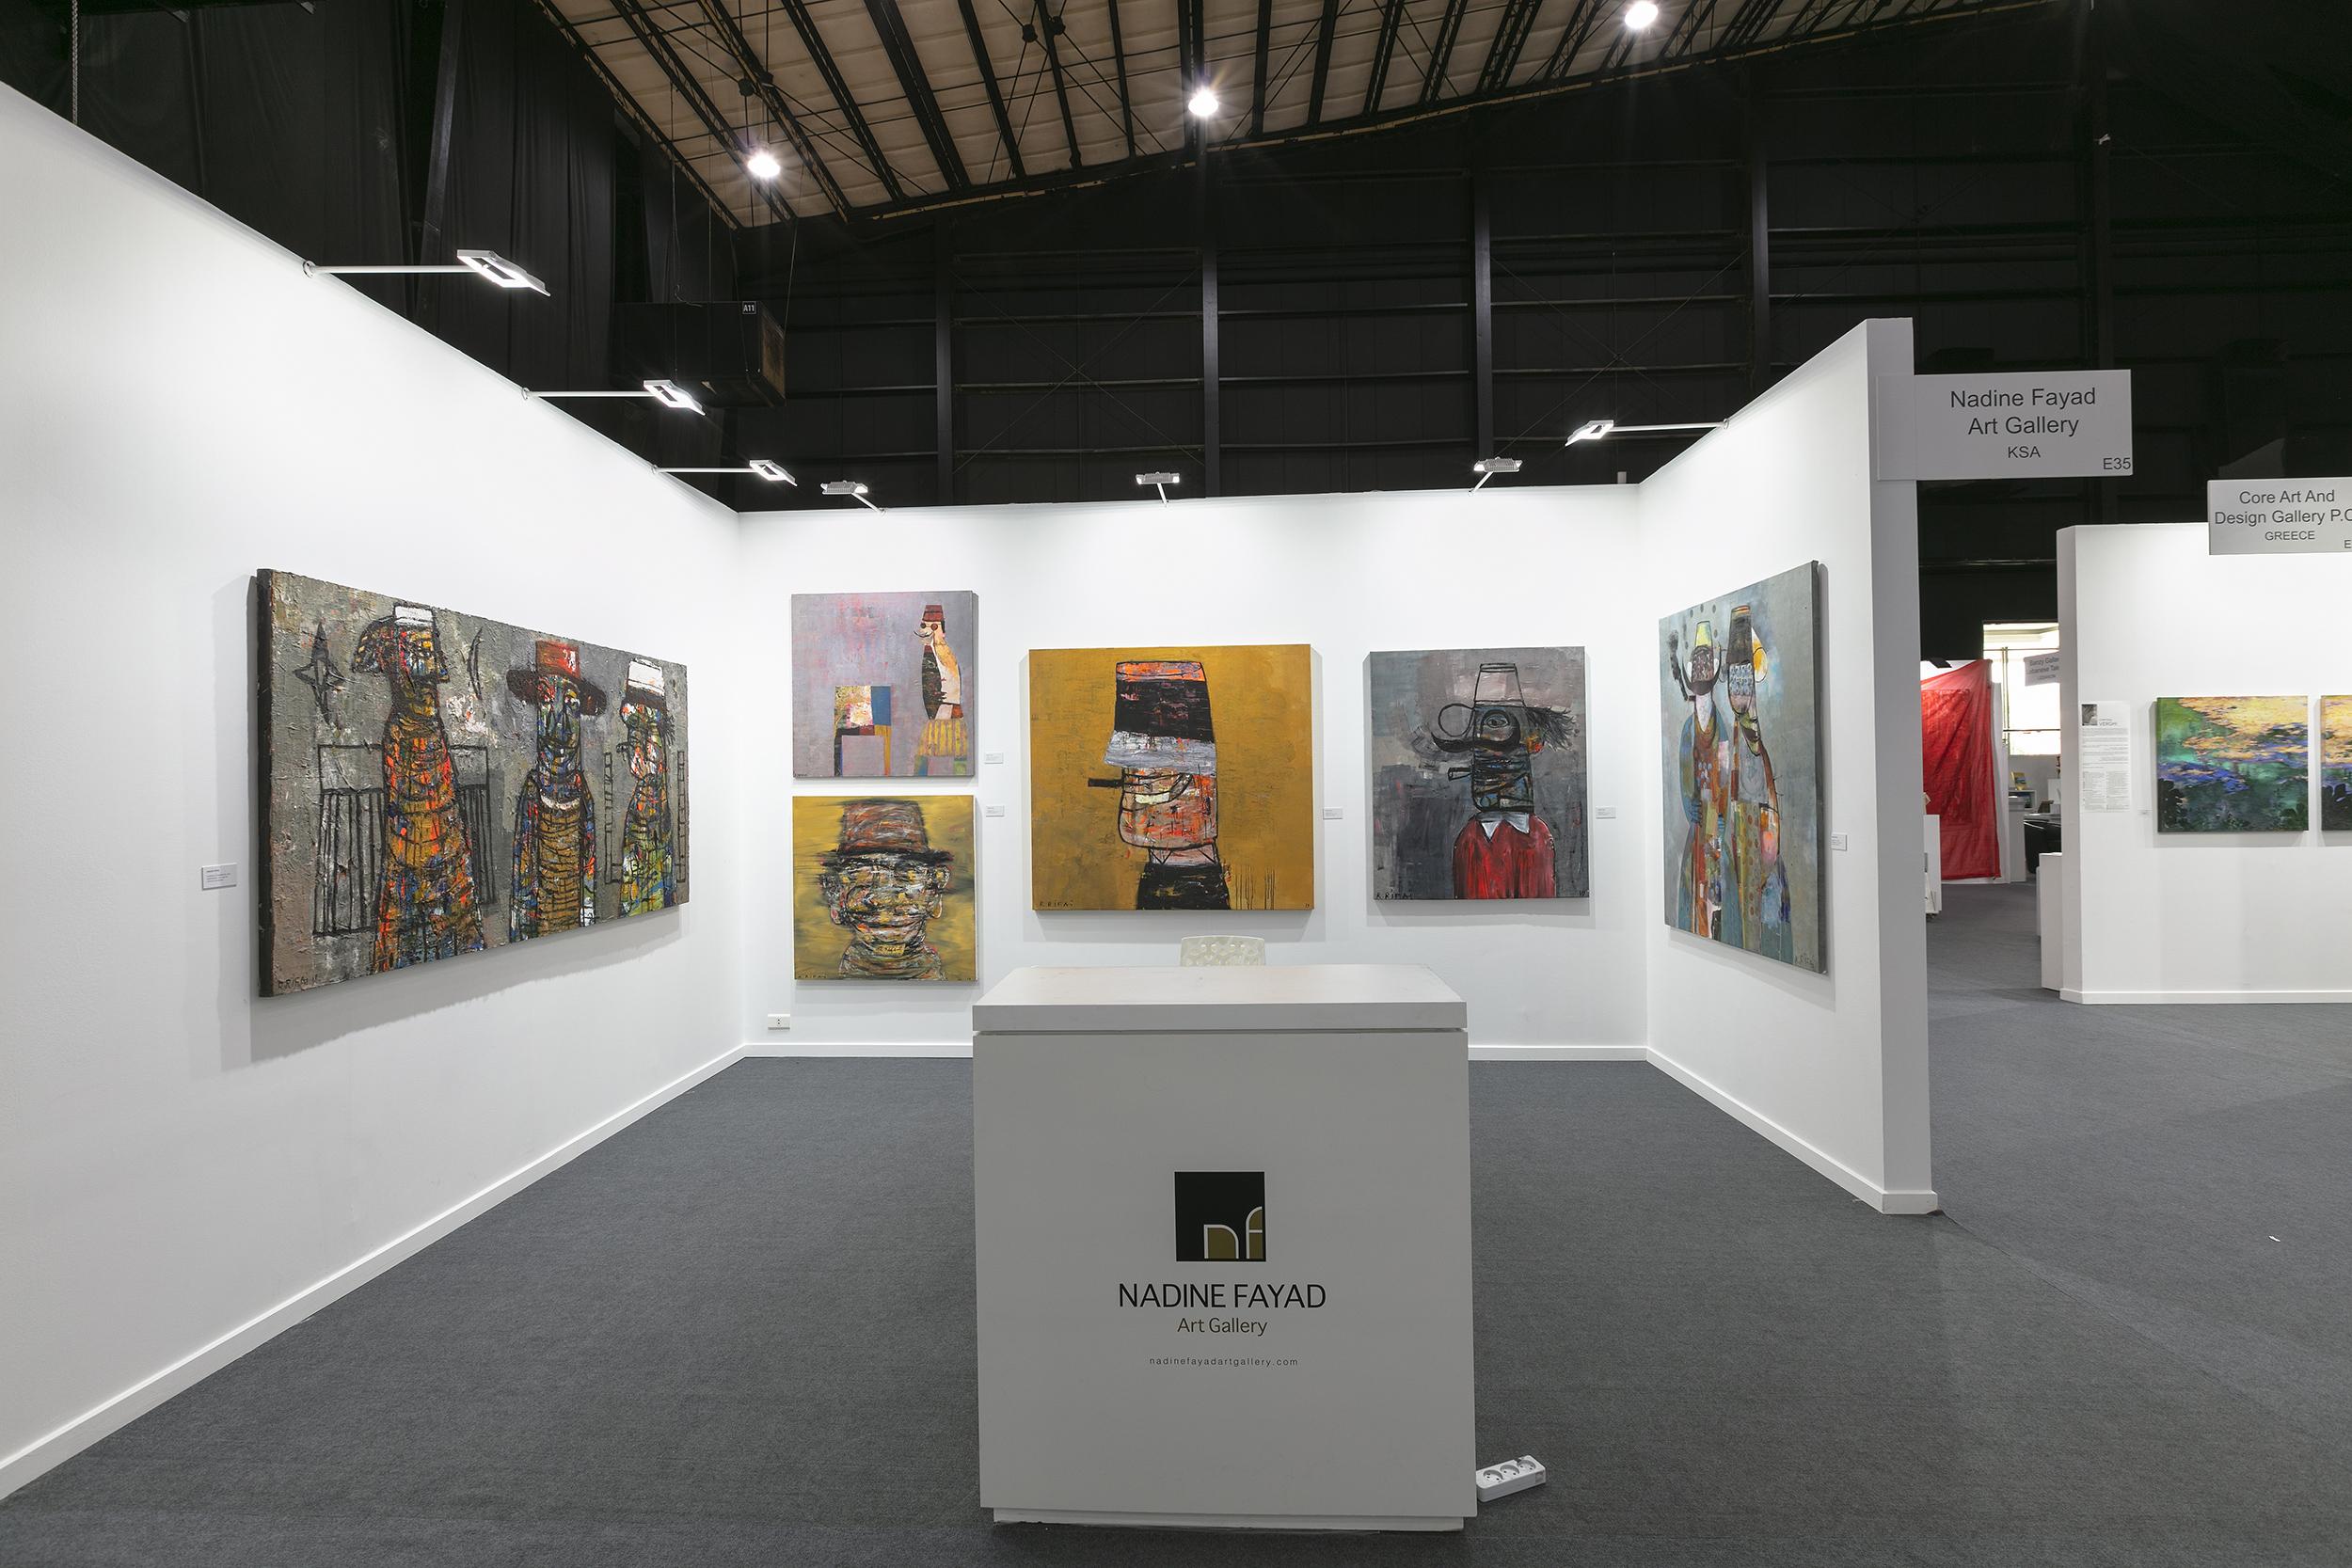 Nadine Fayad Art Gallery